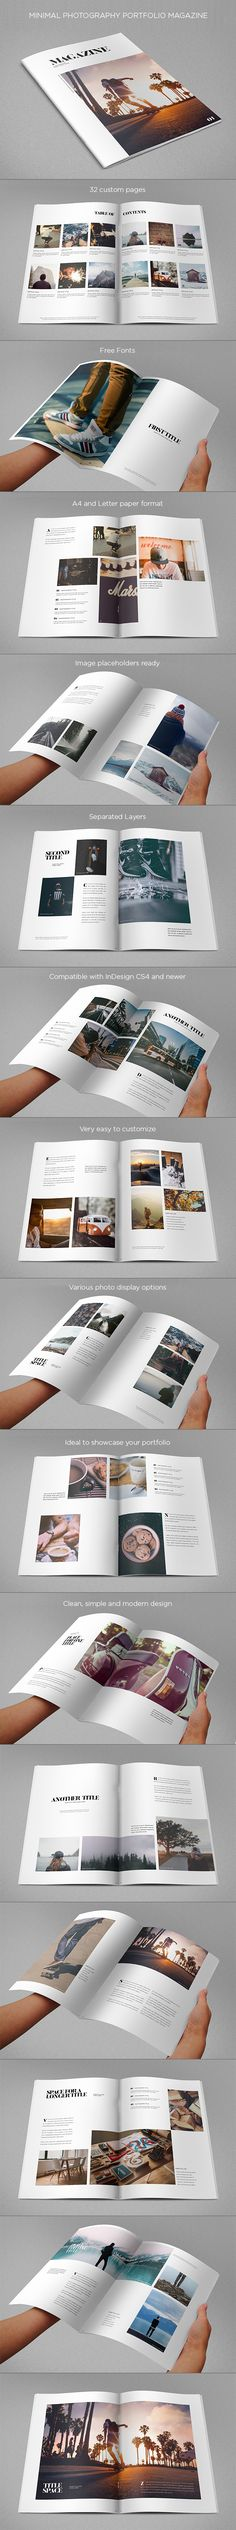 Minimal Photography Portfolio Magazine. Download here: https://goo.gl/MQXoTf